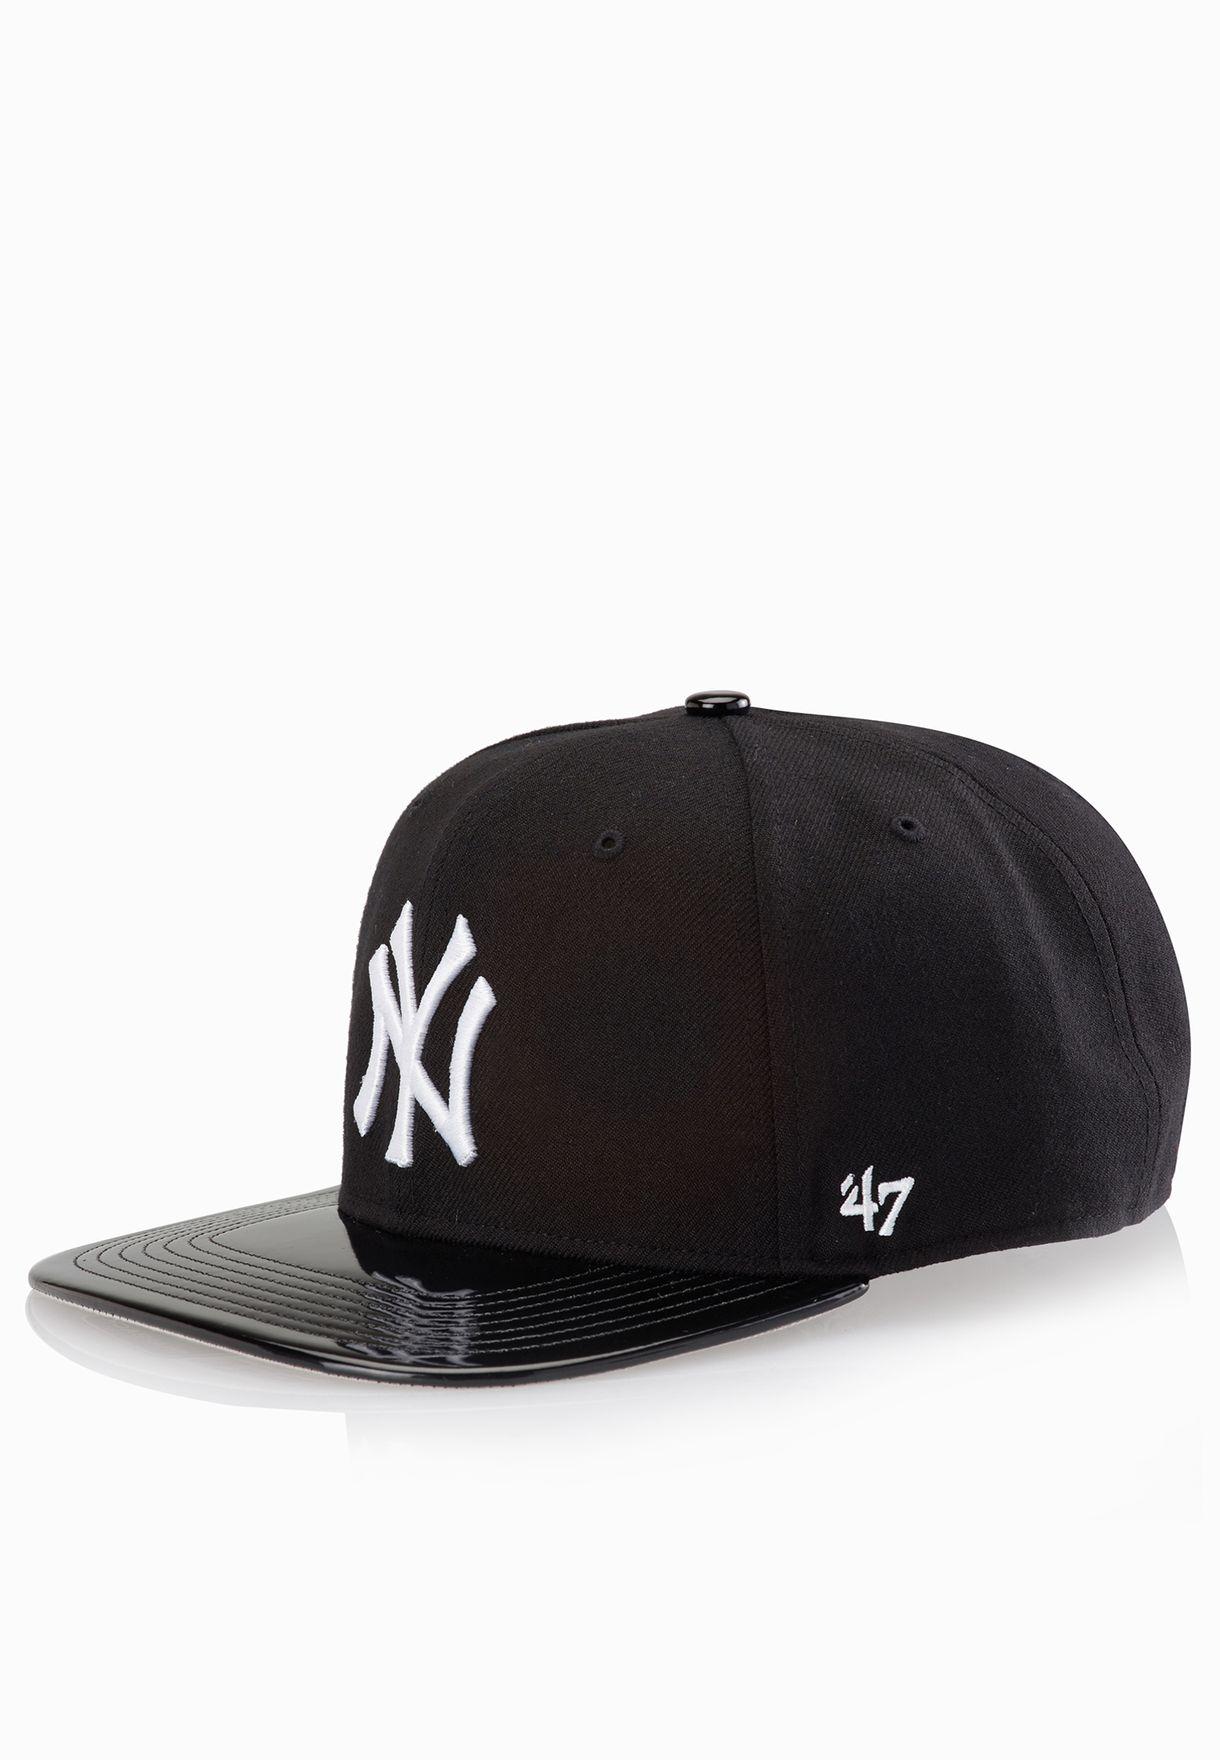 7065cbd742f Shop 47 Brand black New York Yankees Shinedown Snapback Cap B ...